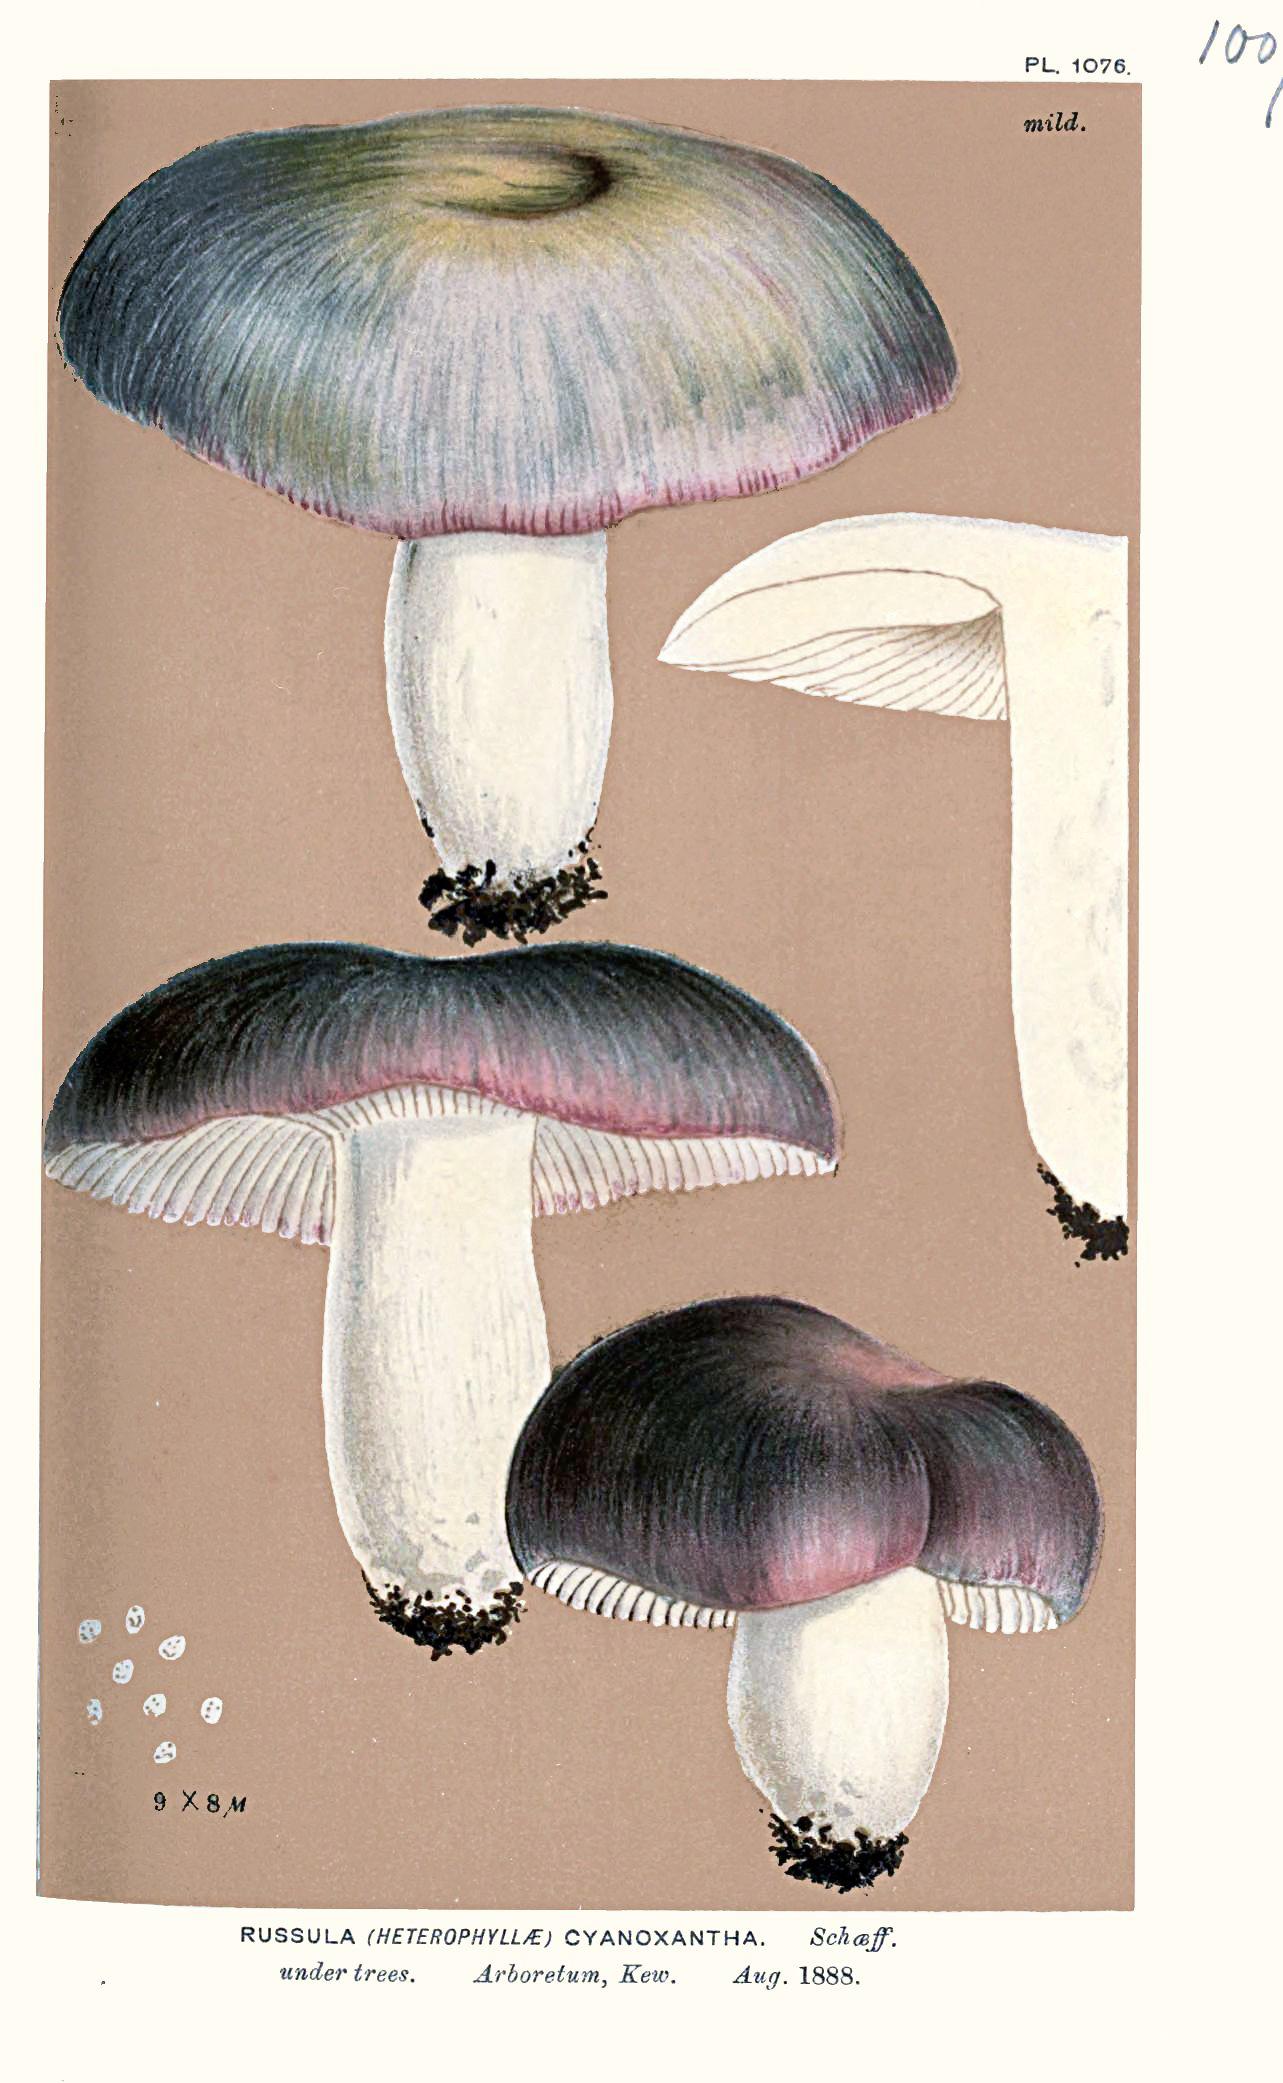 Russula cyanoxantha - The Hall of Einar